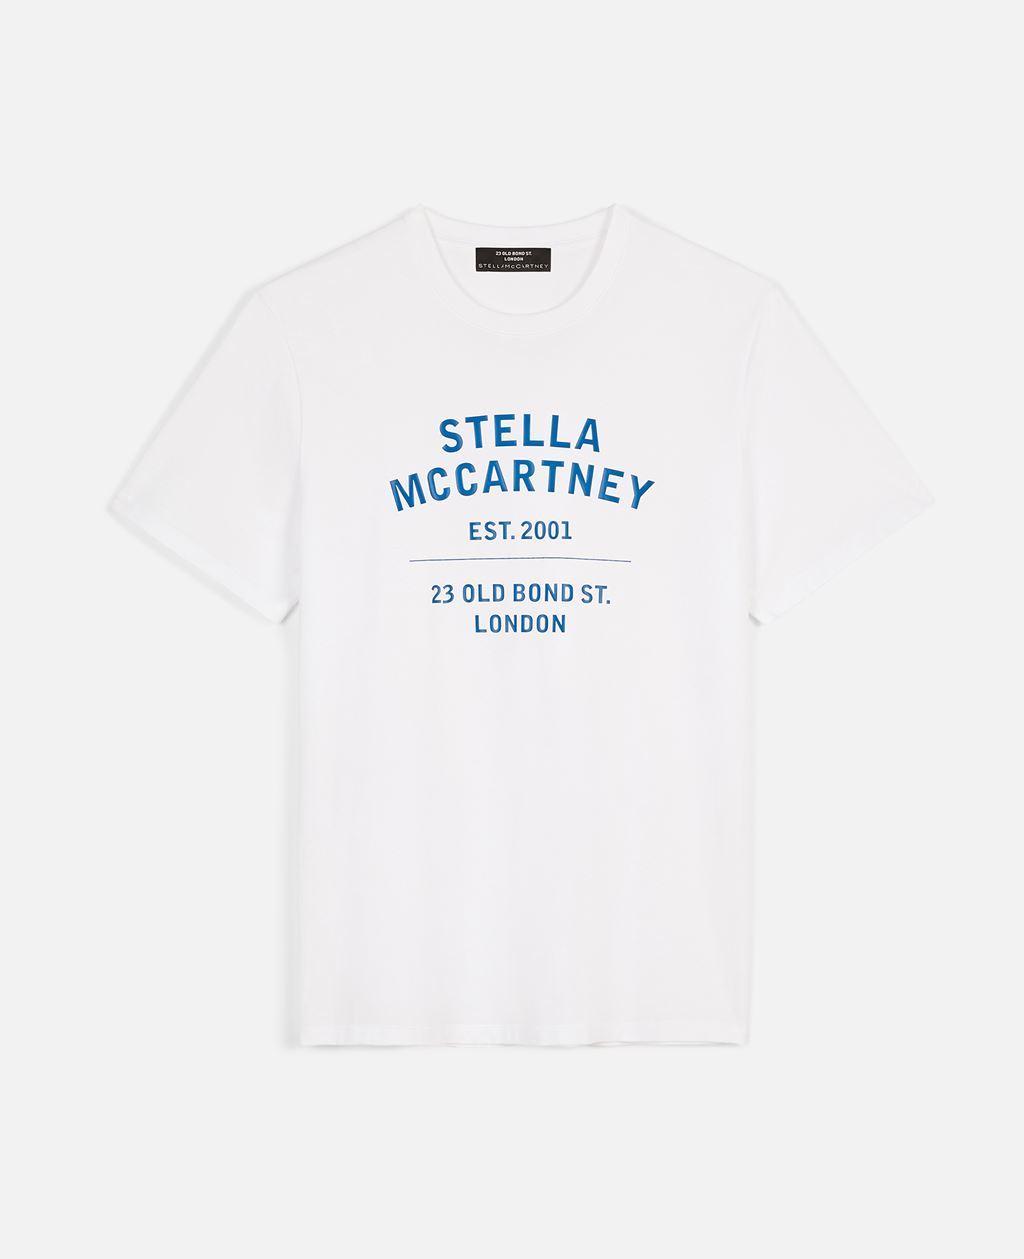 Stella Mccartney STELLA MCCARTNEY WHITE 23 OBS ORGANIC COTTON T-SHIRT